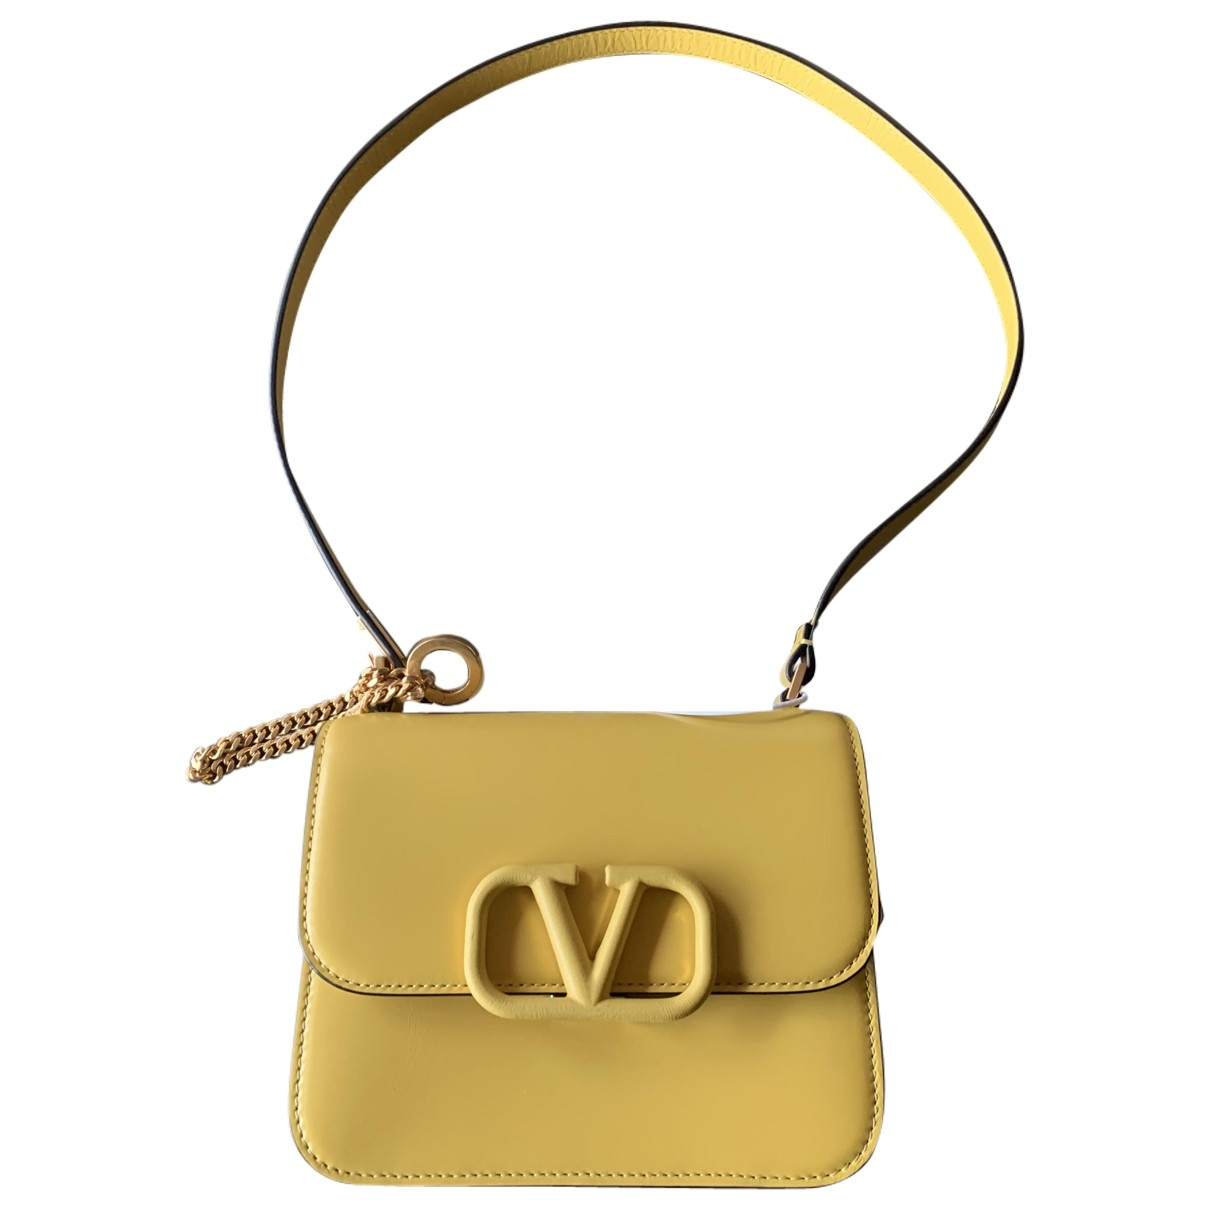 Valentino Garavani Vsling Handtasche in  Gelb Leder